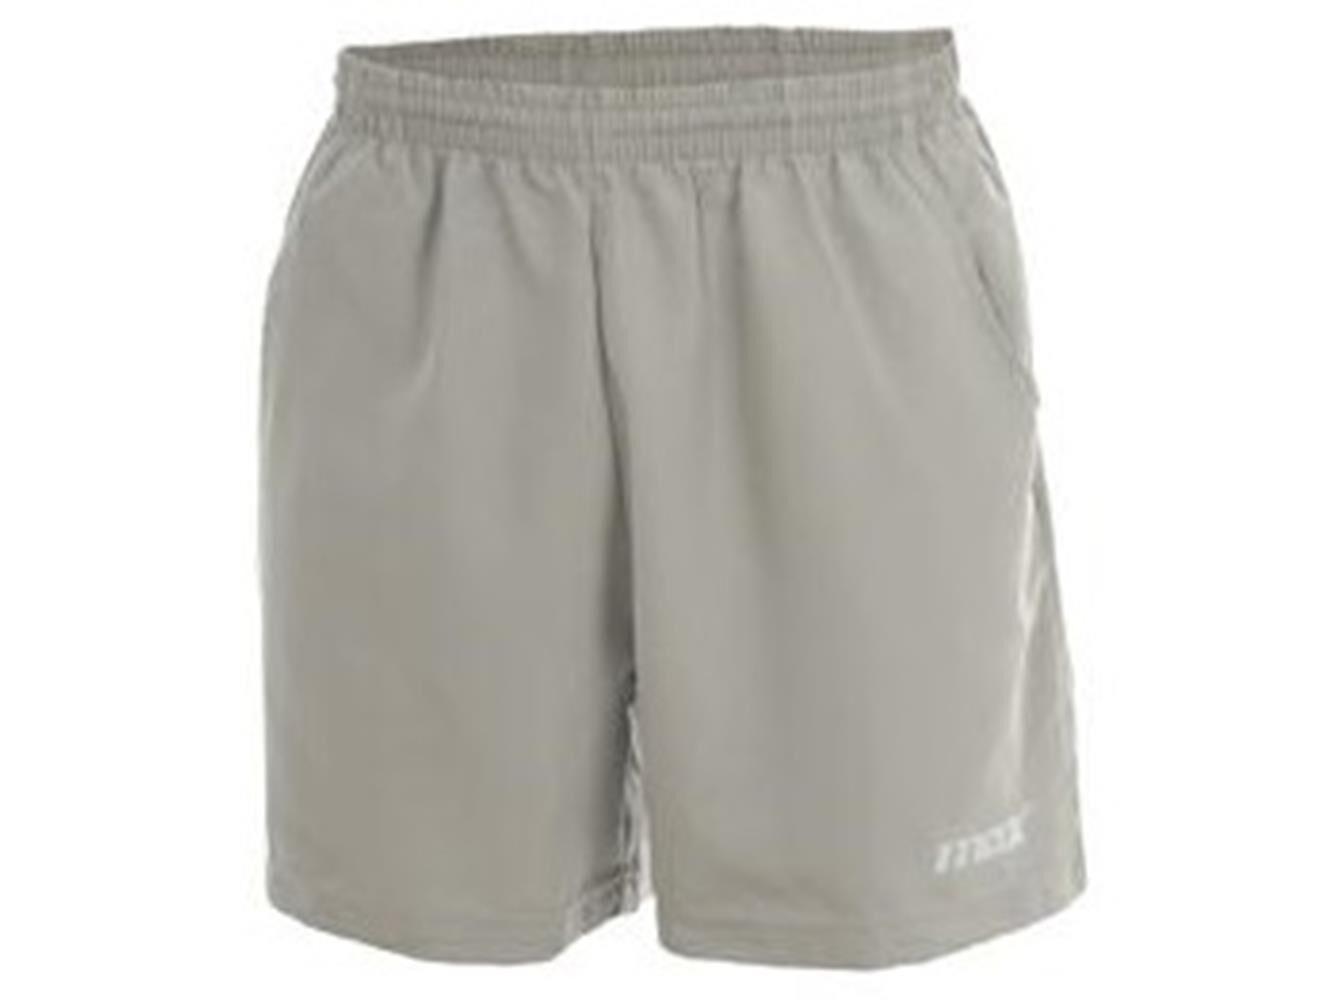 max pantaloncino tennis/tempo libero short free time max